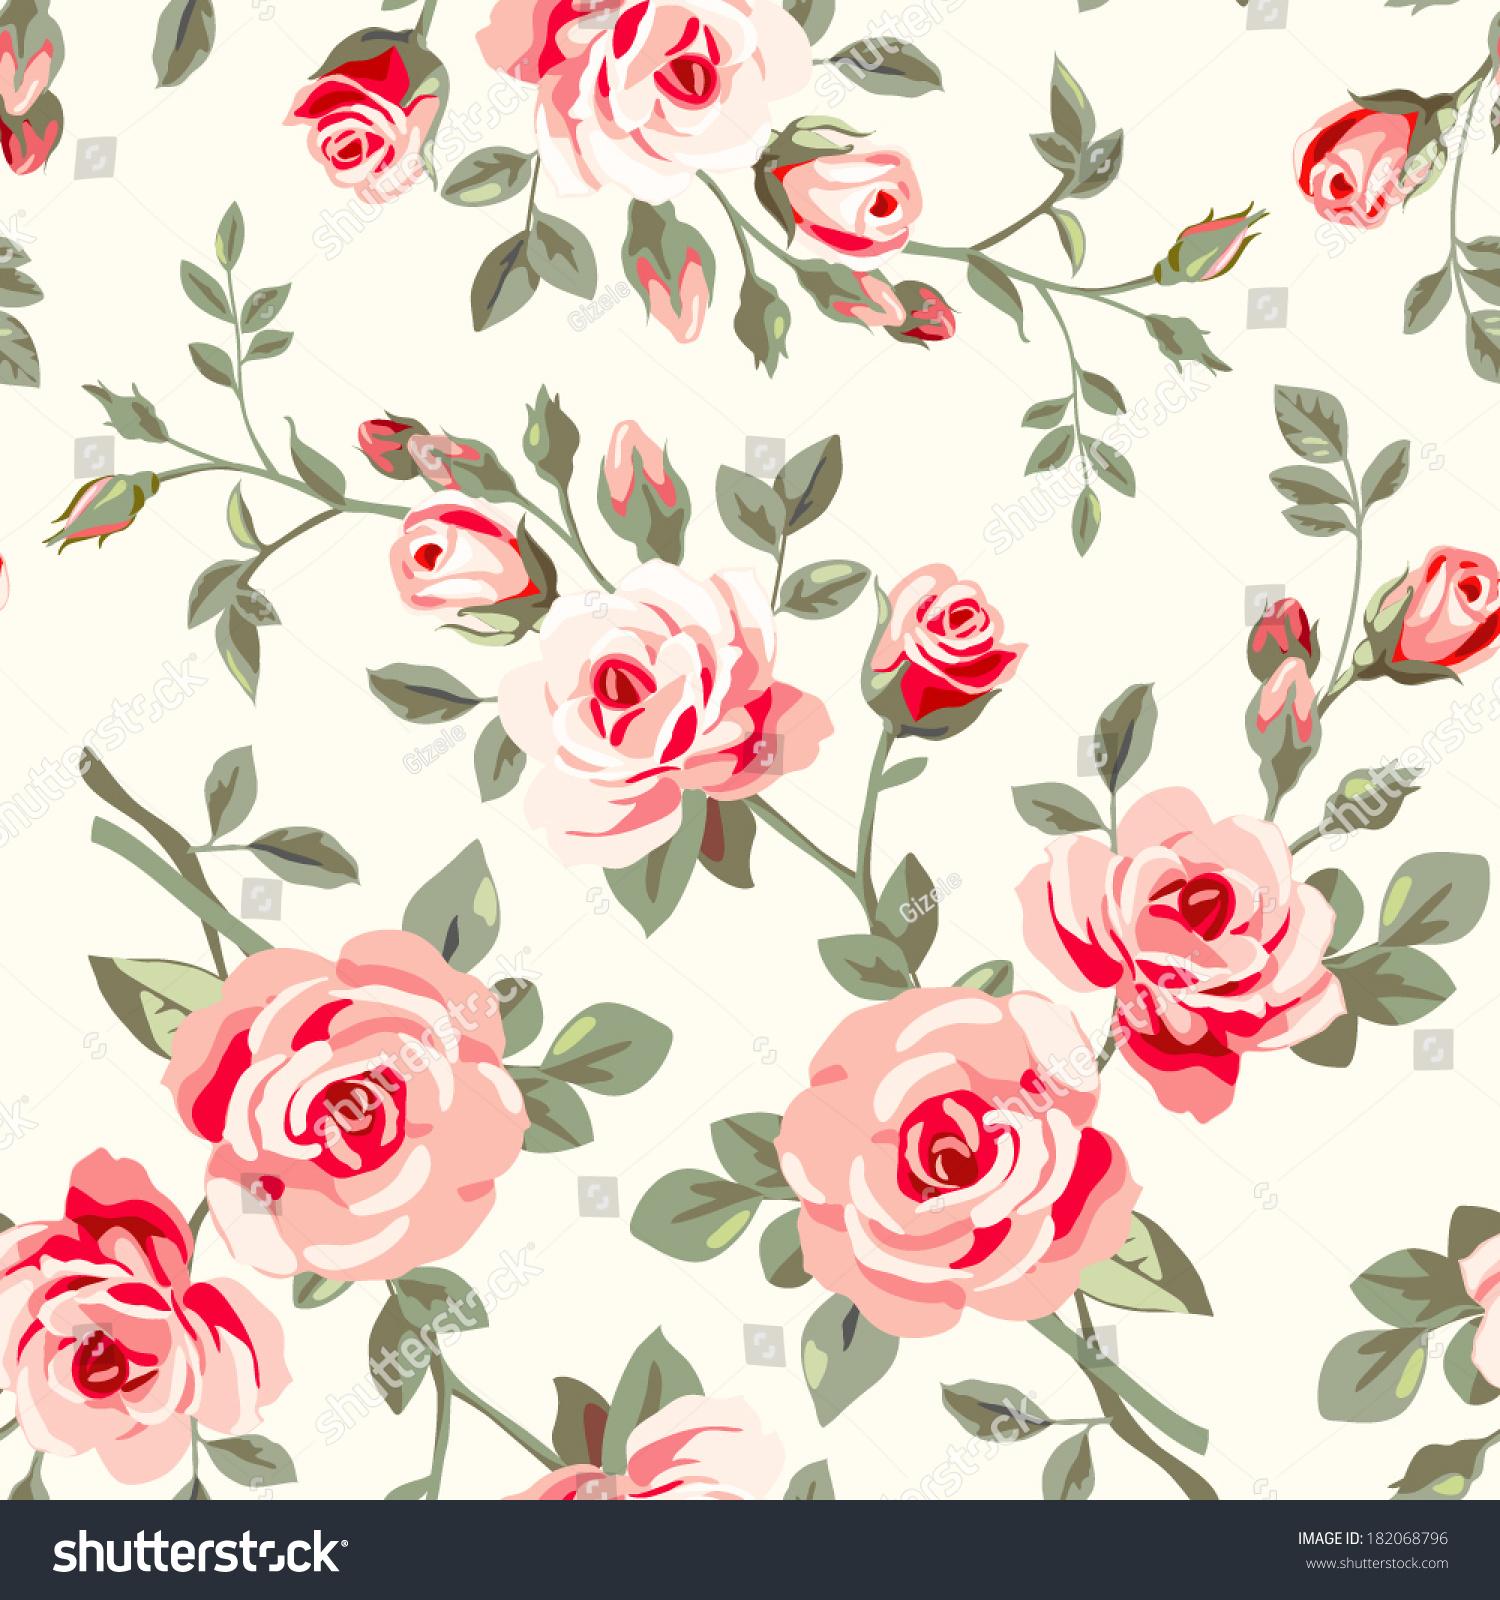 Unduh 54 Koleksi Wallpaper Garskin Cantik Gratis Terbaik